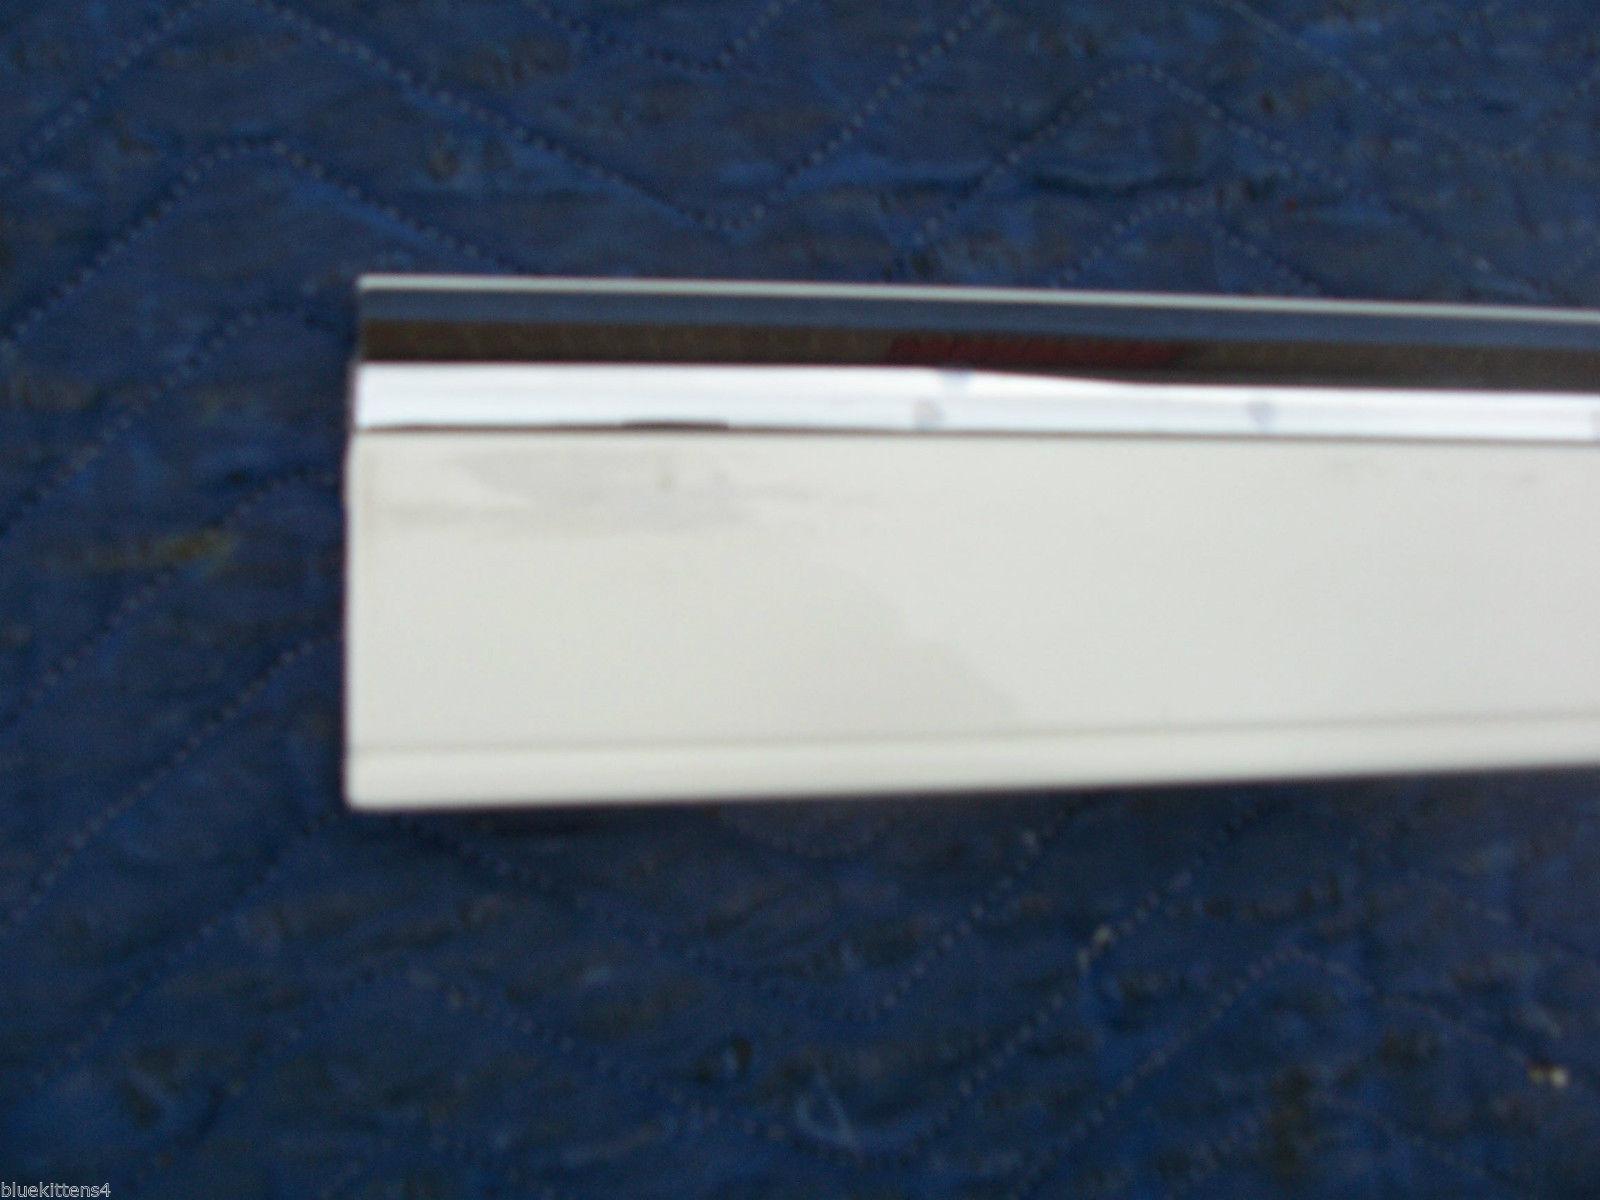 1995 ELDORADO LEFT QUARTER REAR FENDER TRIM MOLDING OEM USED ORIG GM CADILLAC # image 2